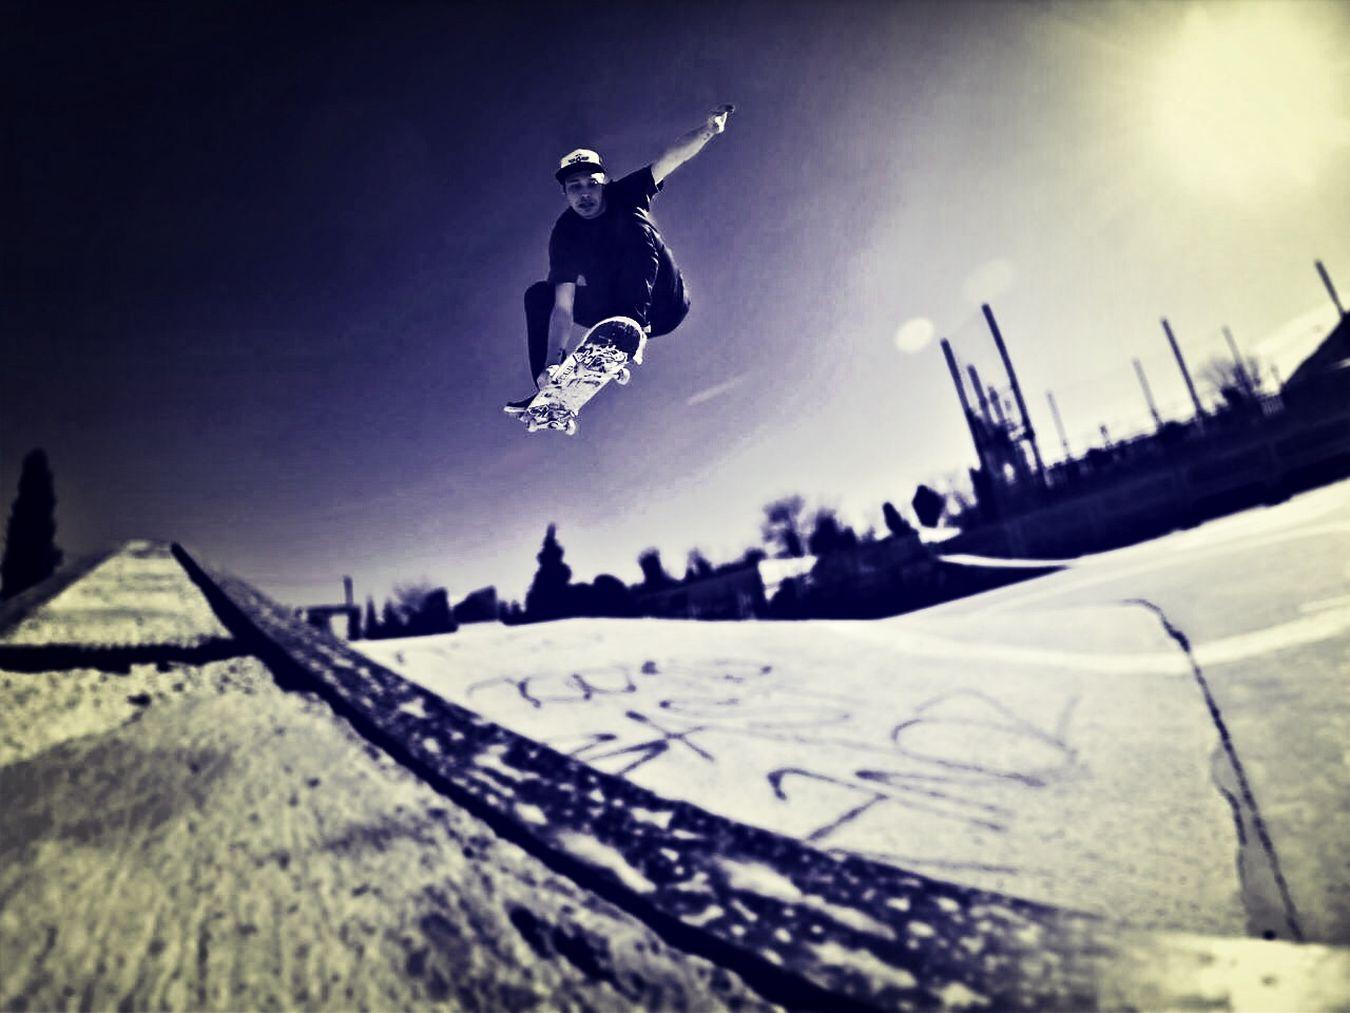 Extreme Skateboarding Enjoying Life That's Me